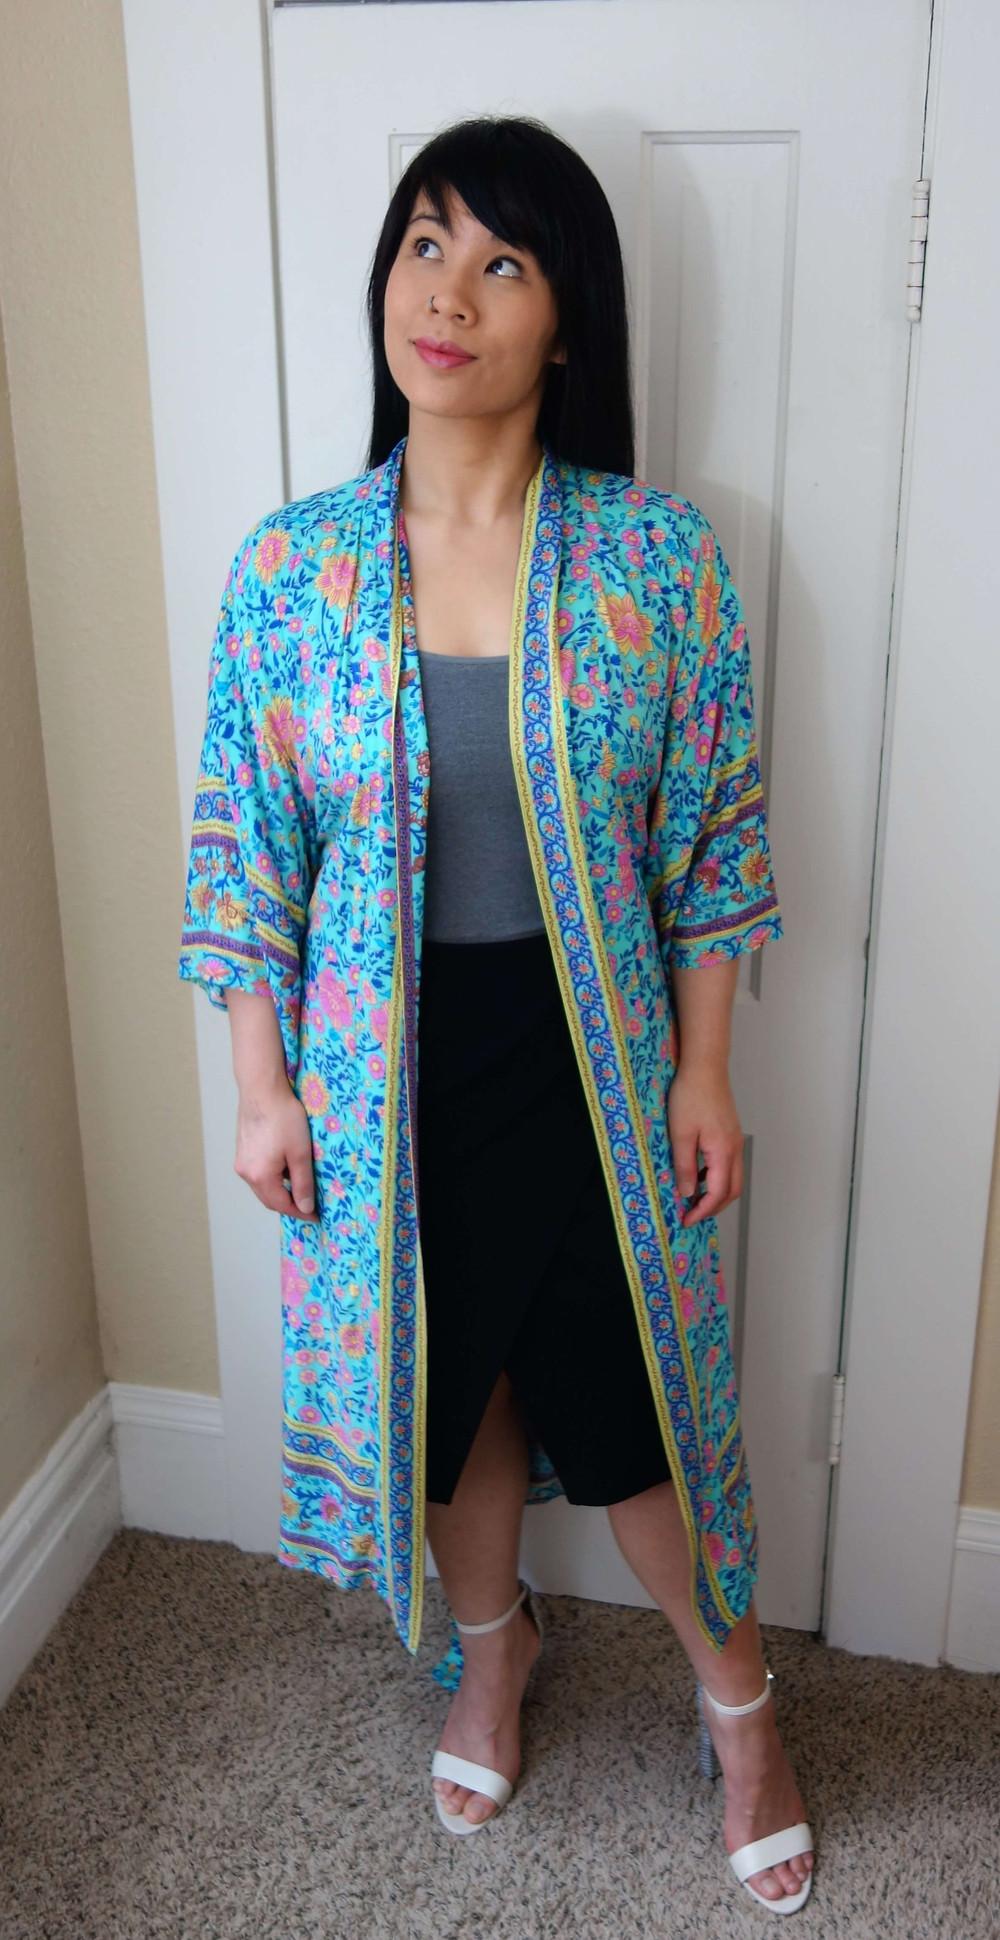 Kat wearing boho kimono